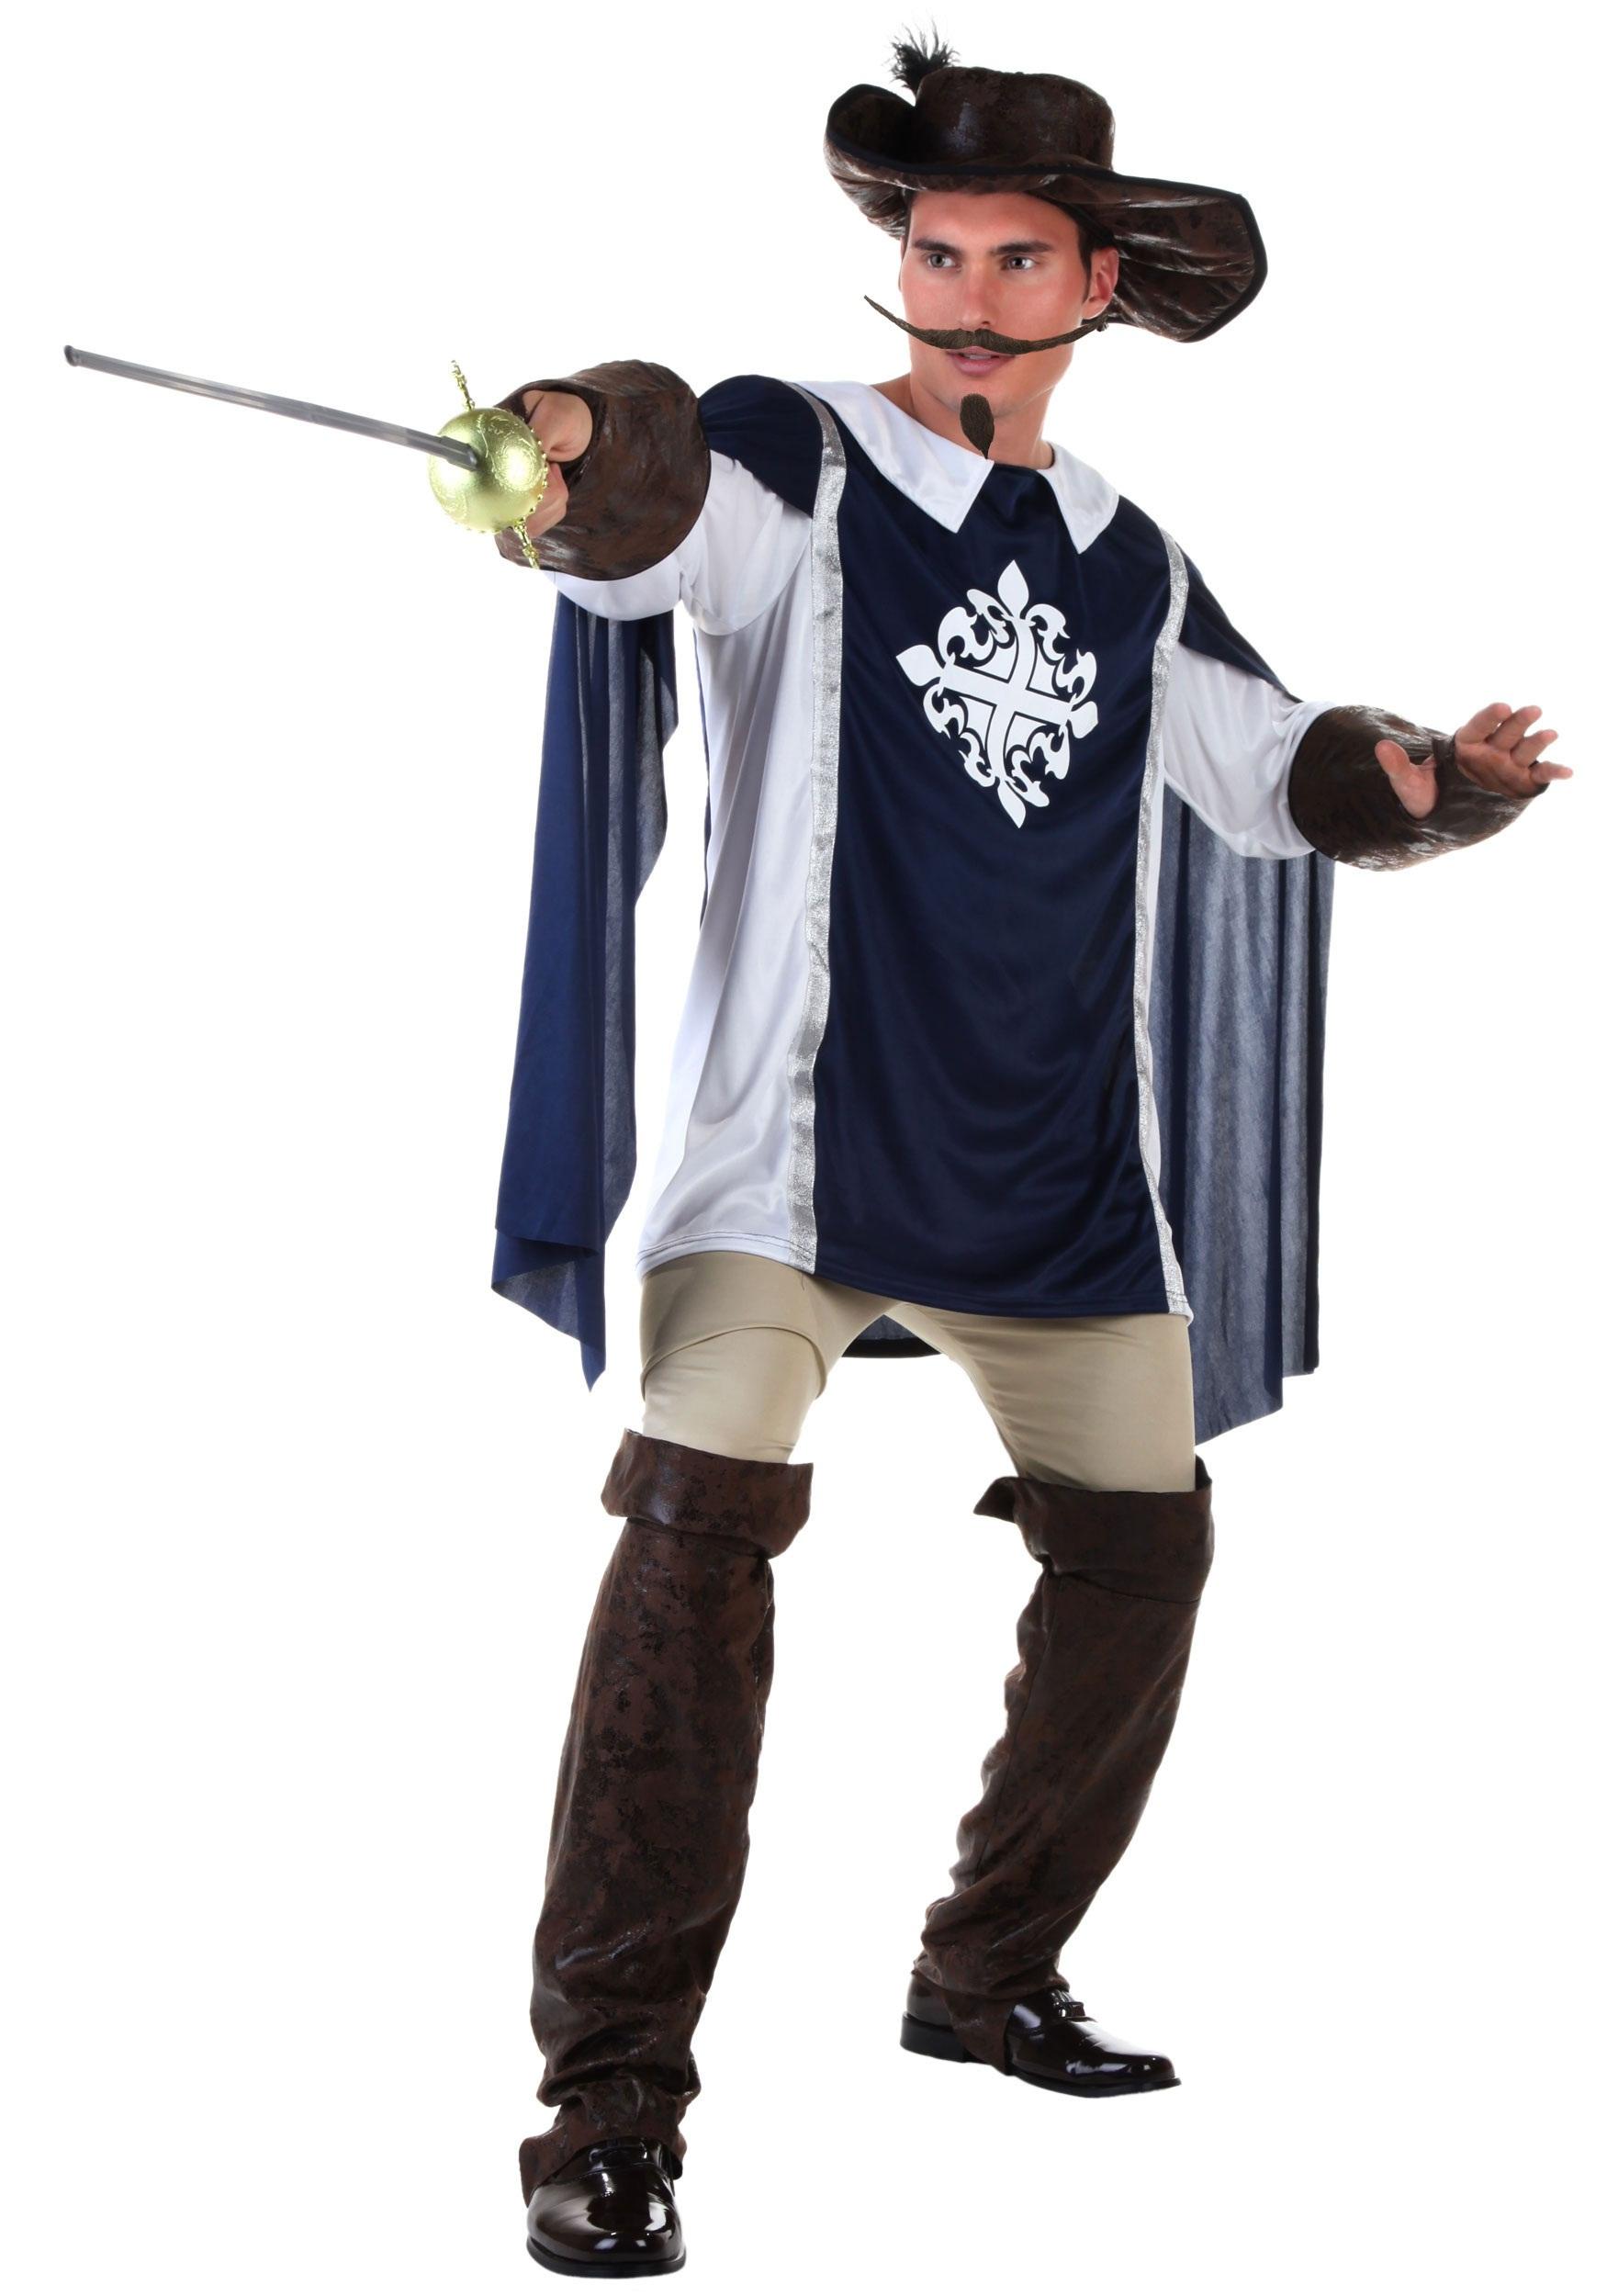 Musketeer costume